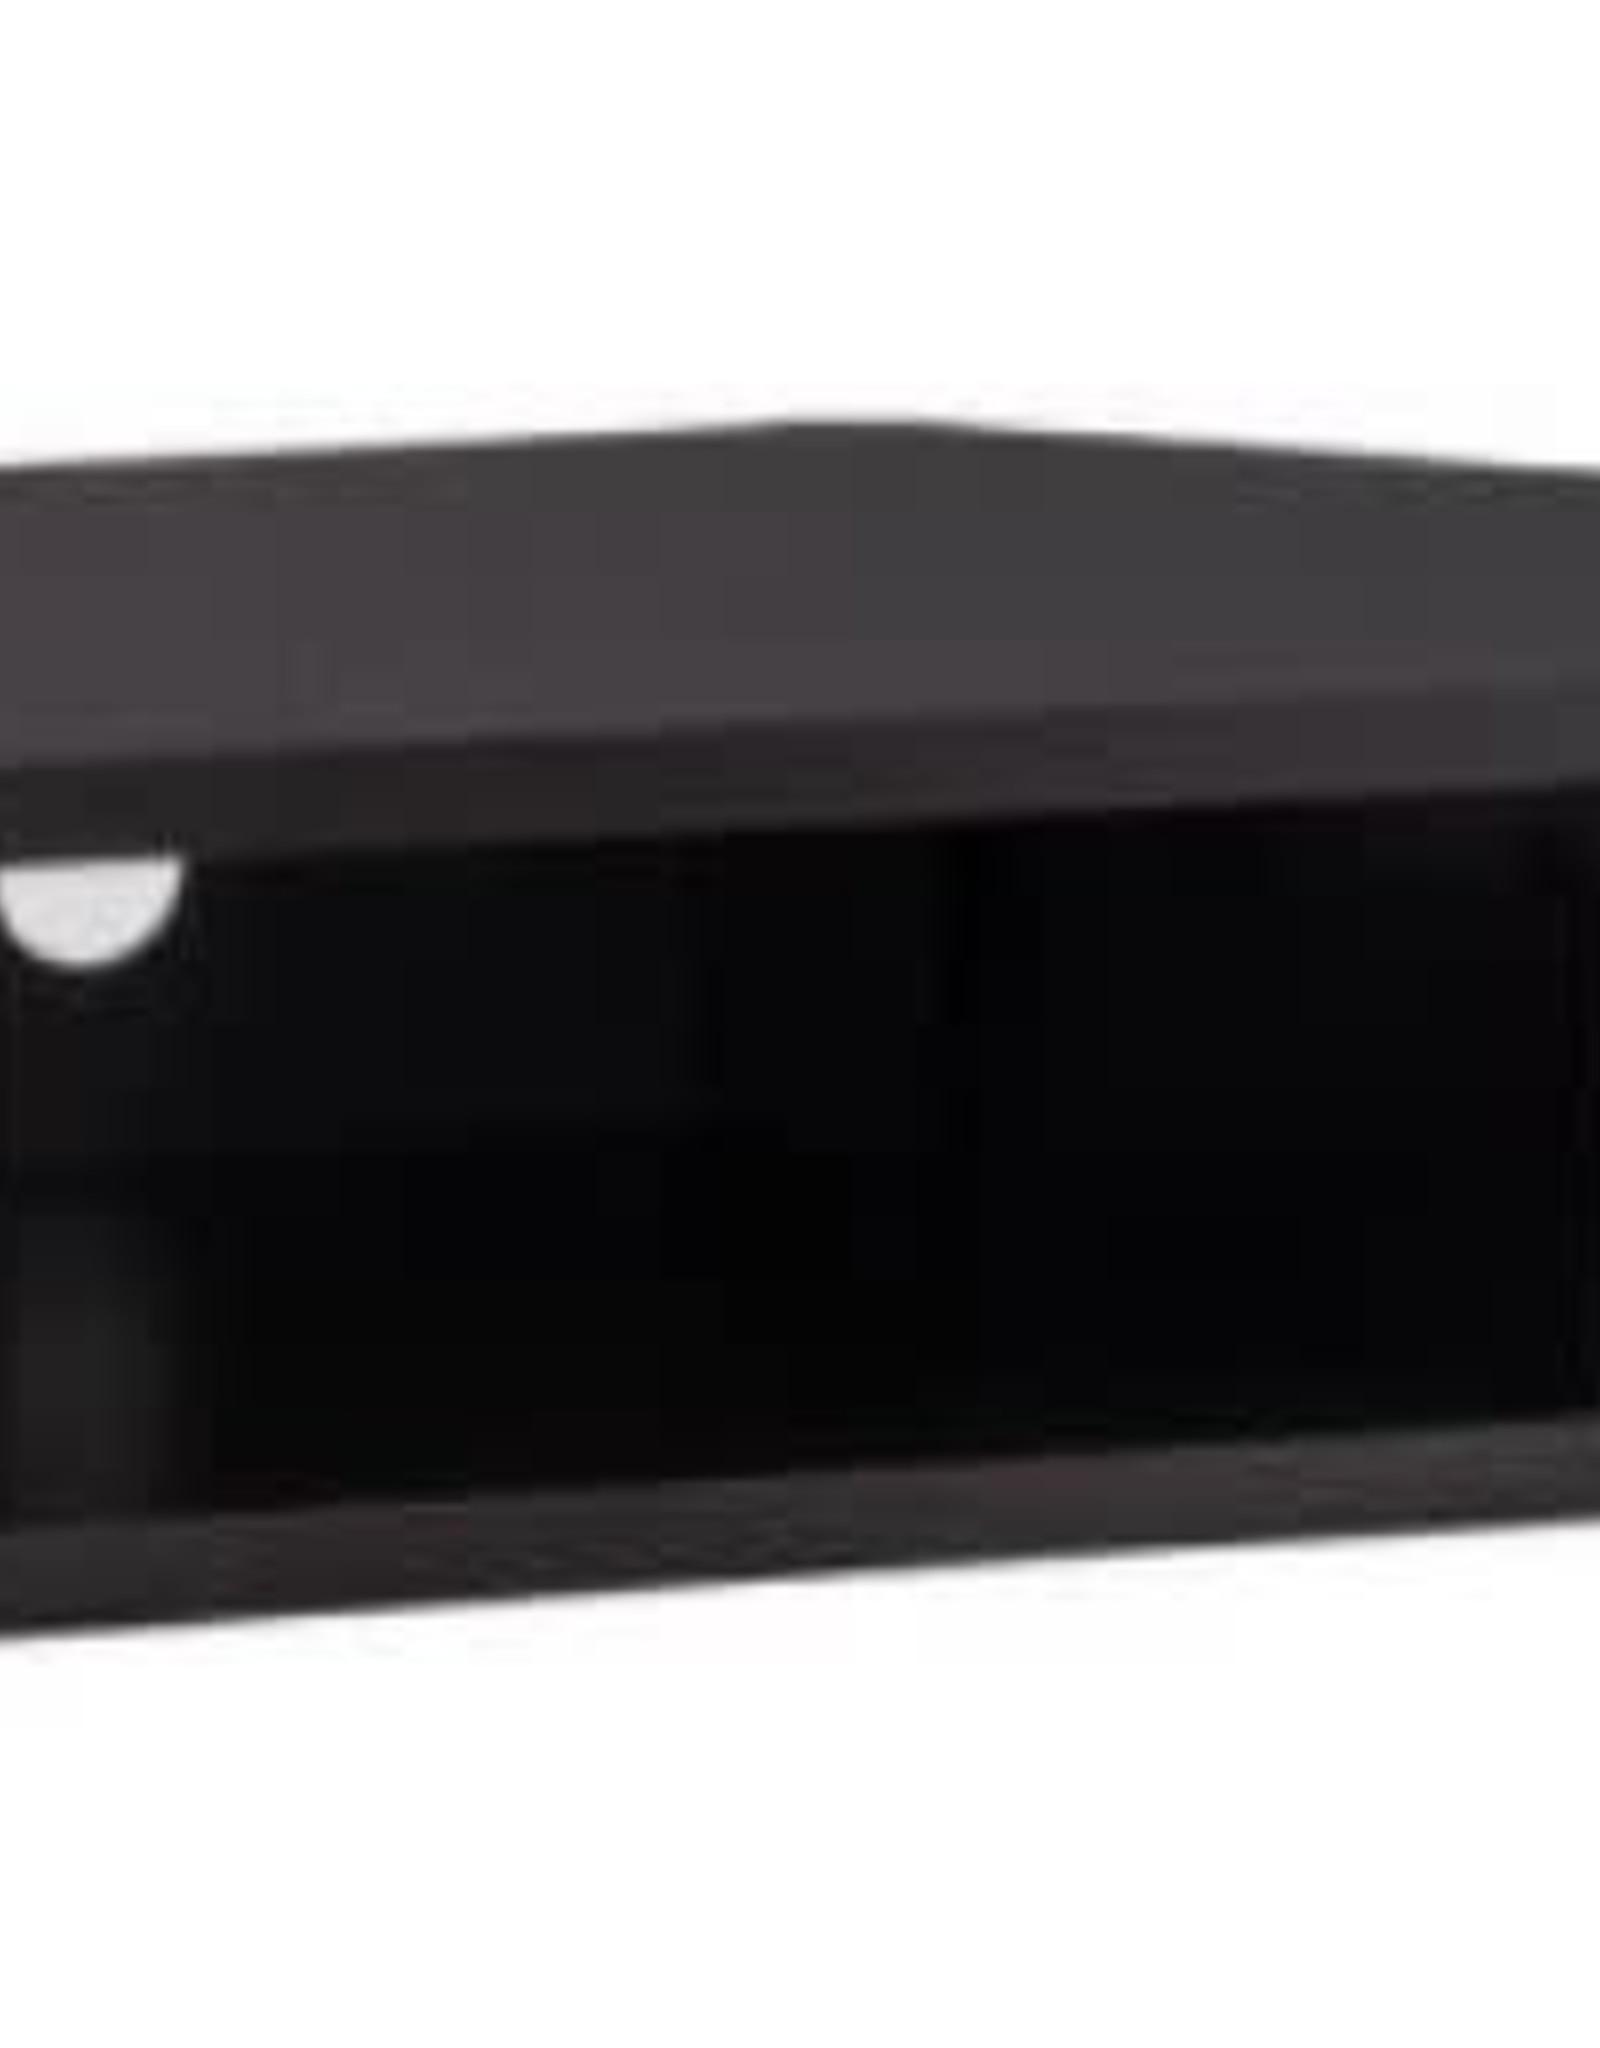 Furniture of America Emmeline 47 in. Cappuccino Particle Board Corner TV Stand